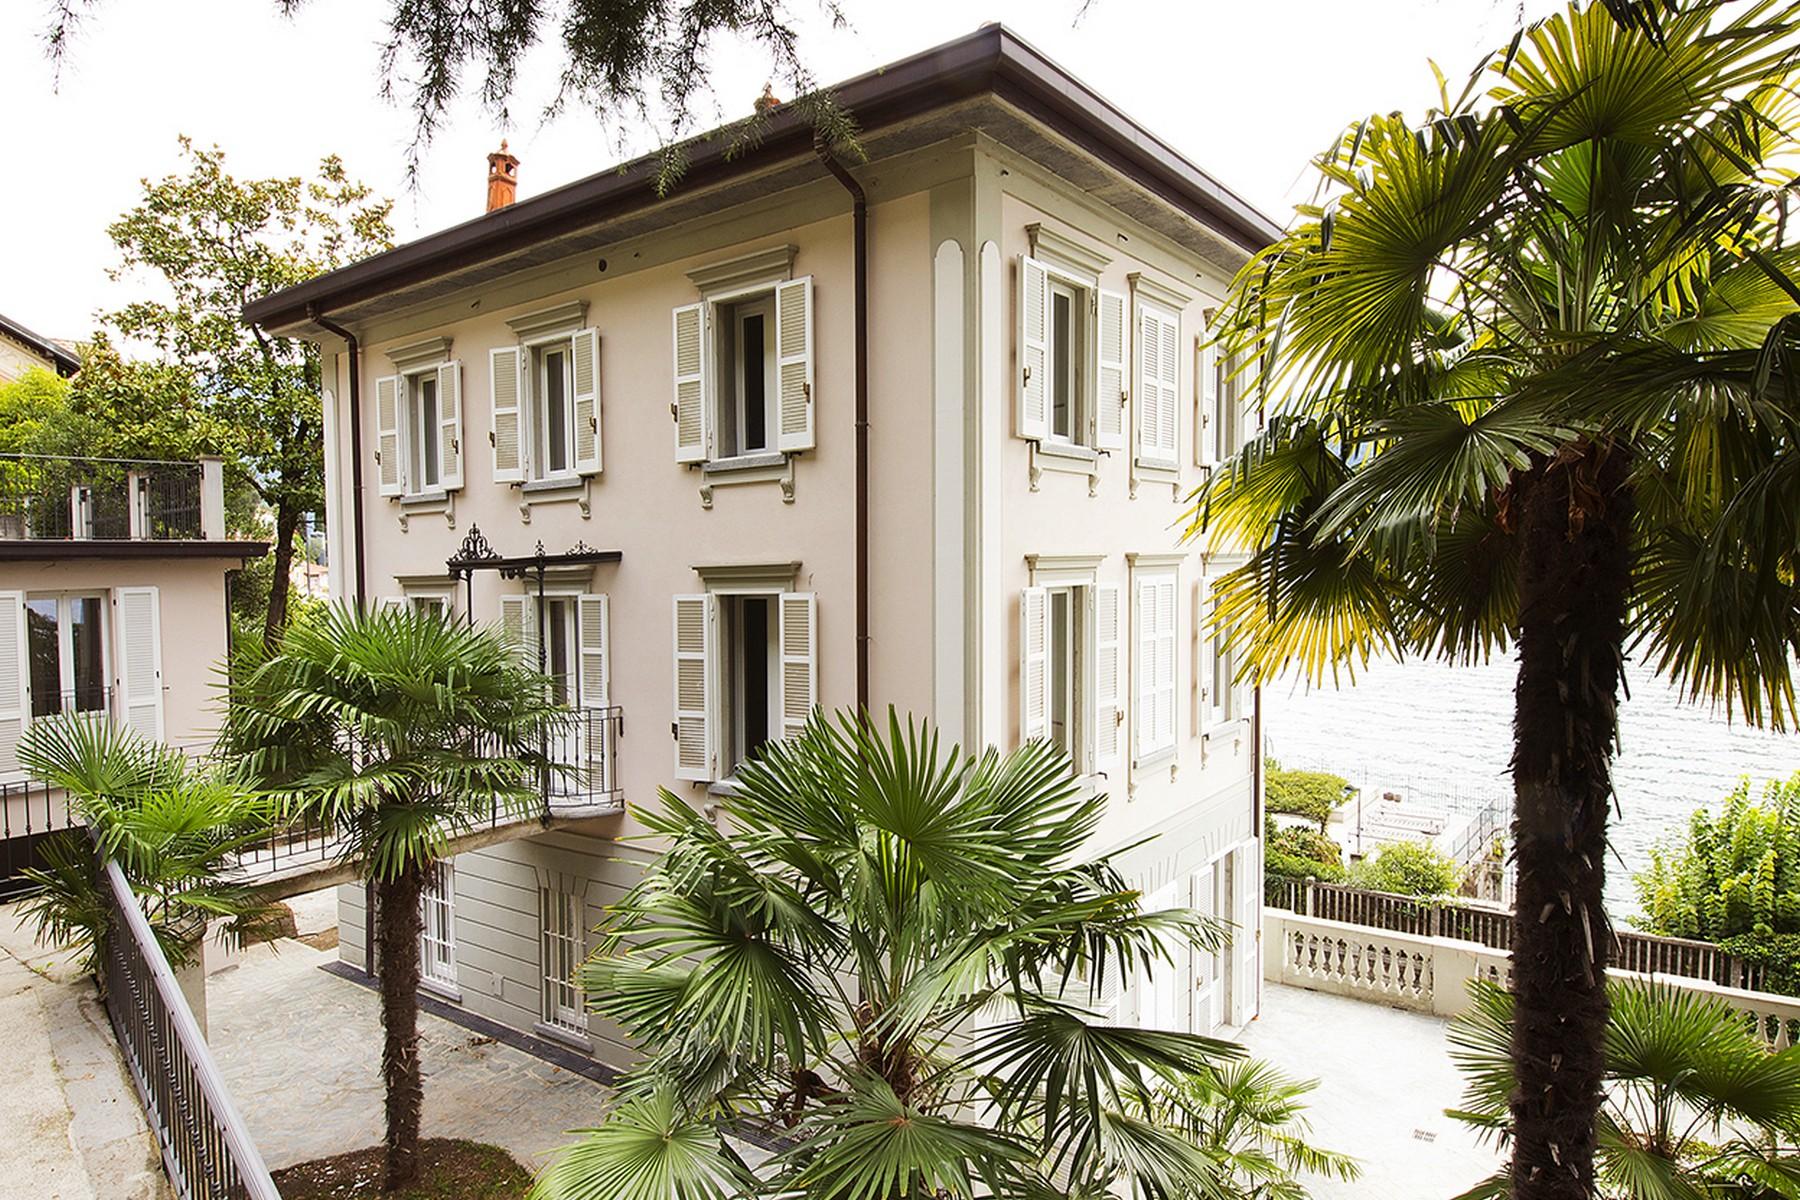 Villa in Vendita a Carate Urio: 5 locali, 270 mq - Foto 2